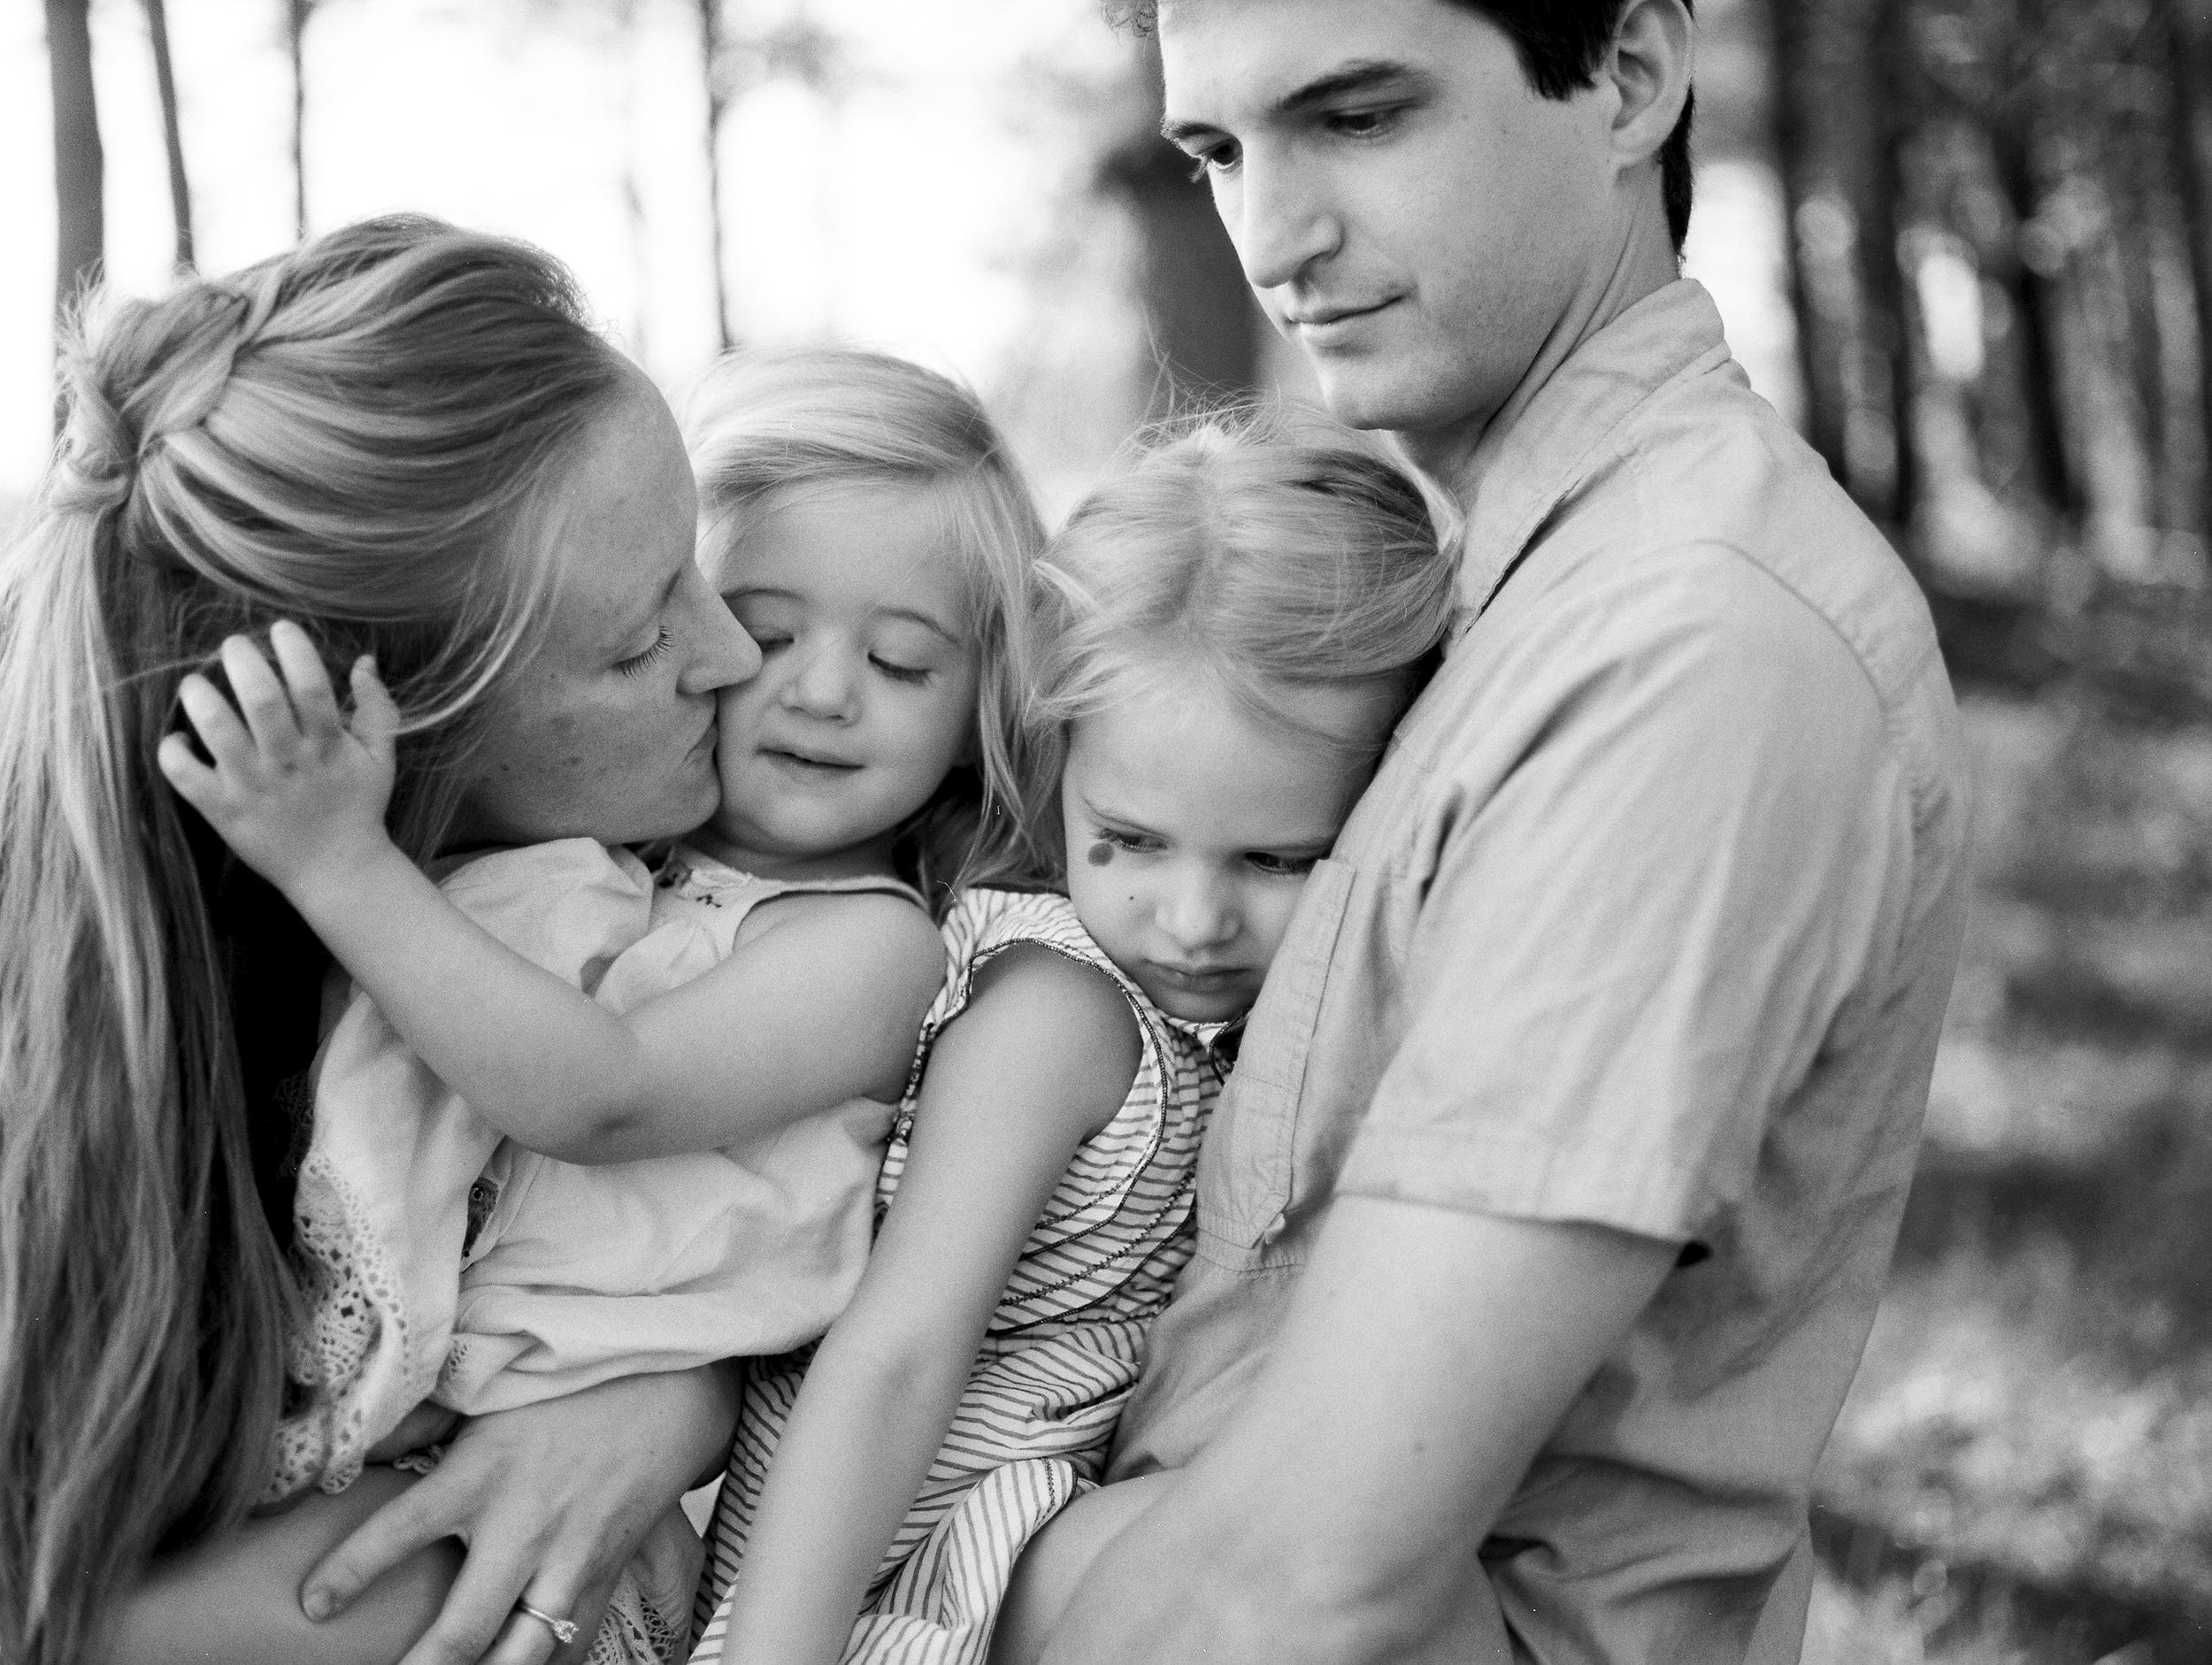 076-athens-georgia-children-and-family-film-photographer.jpg